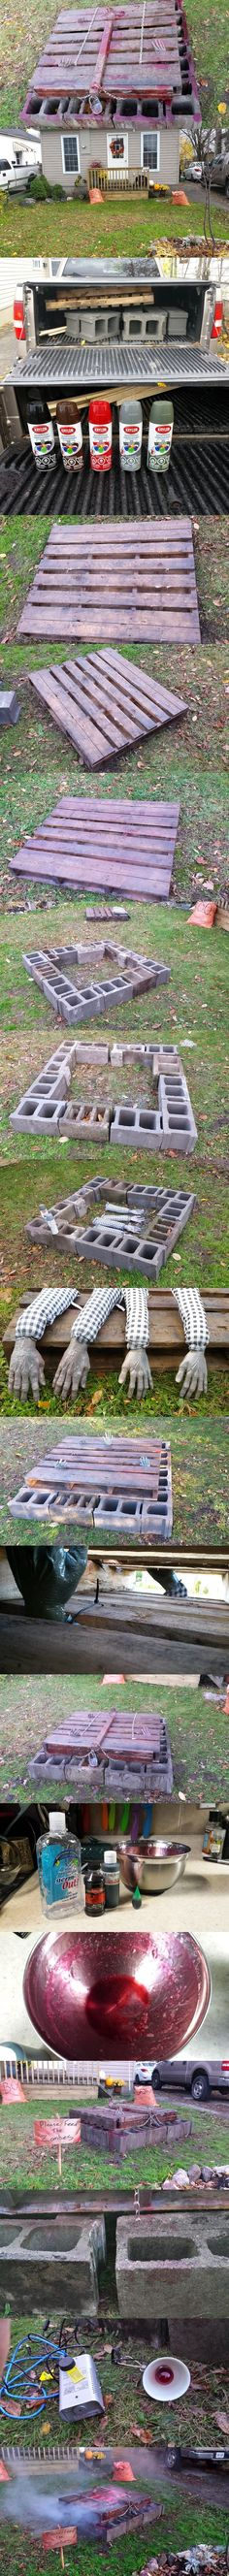 11. Zombie Pit